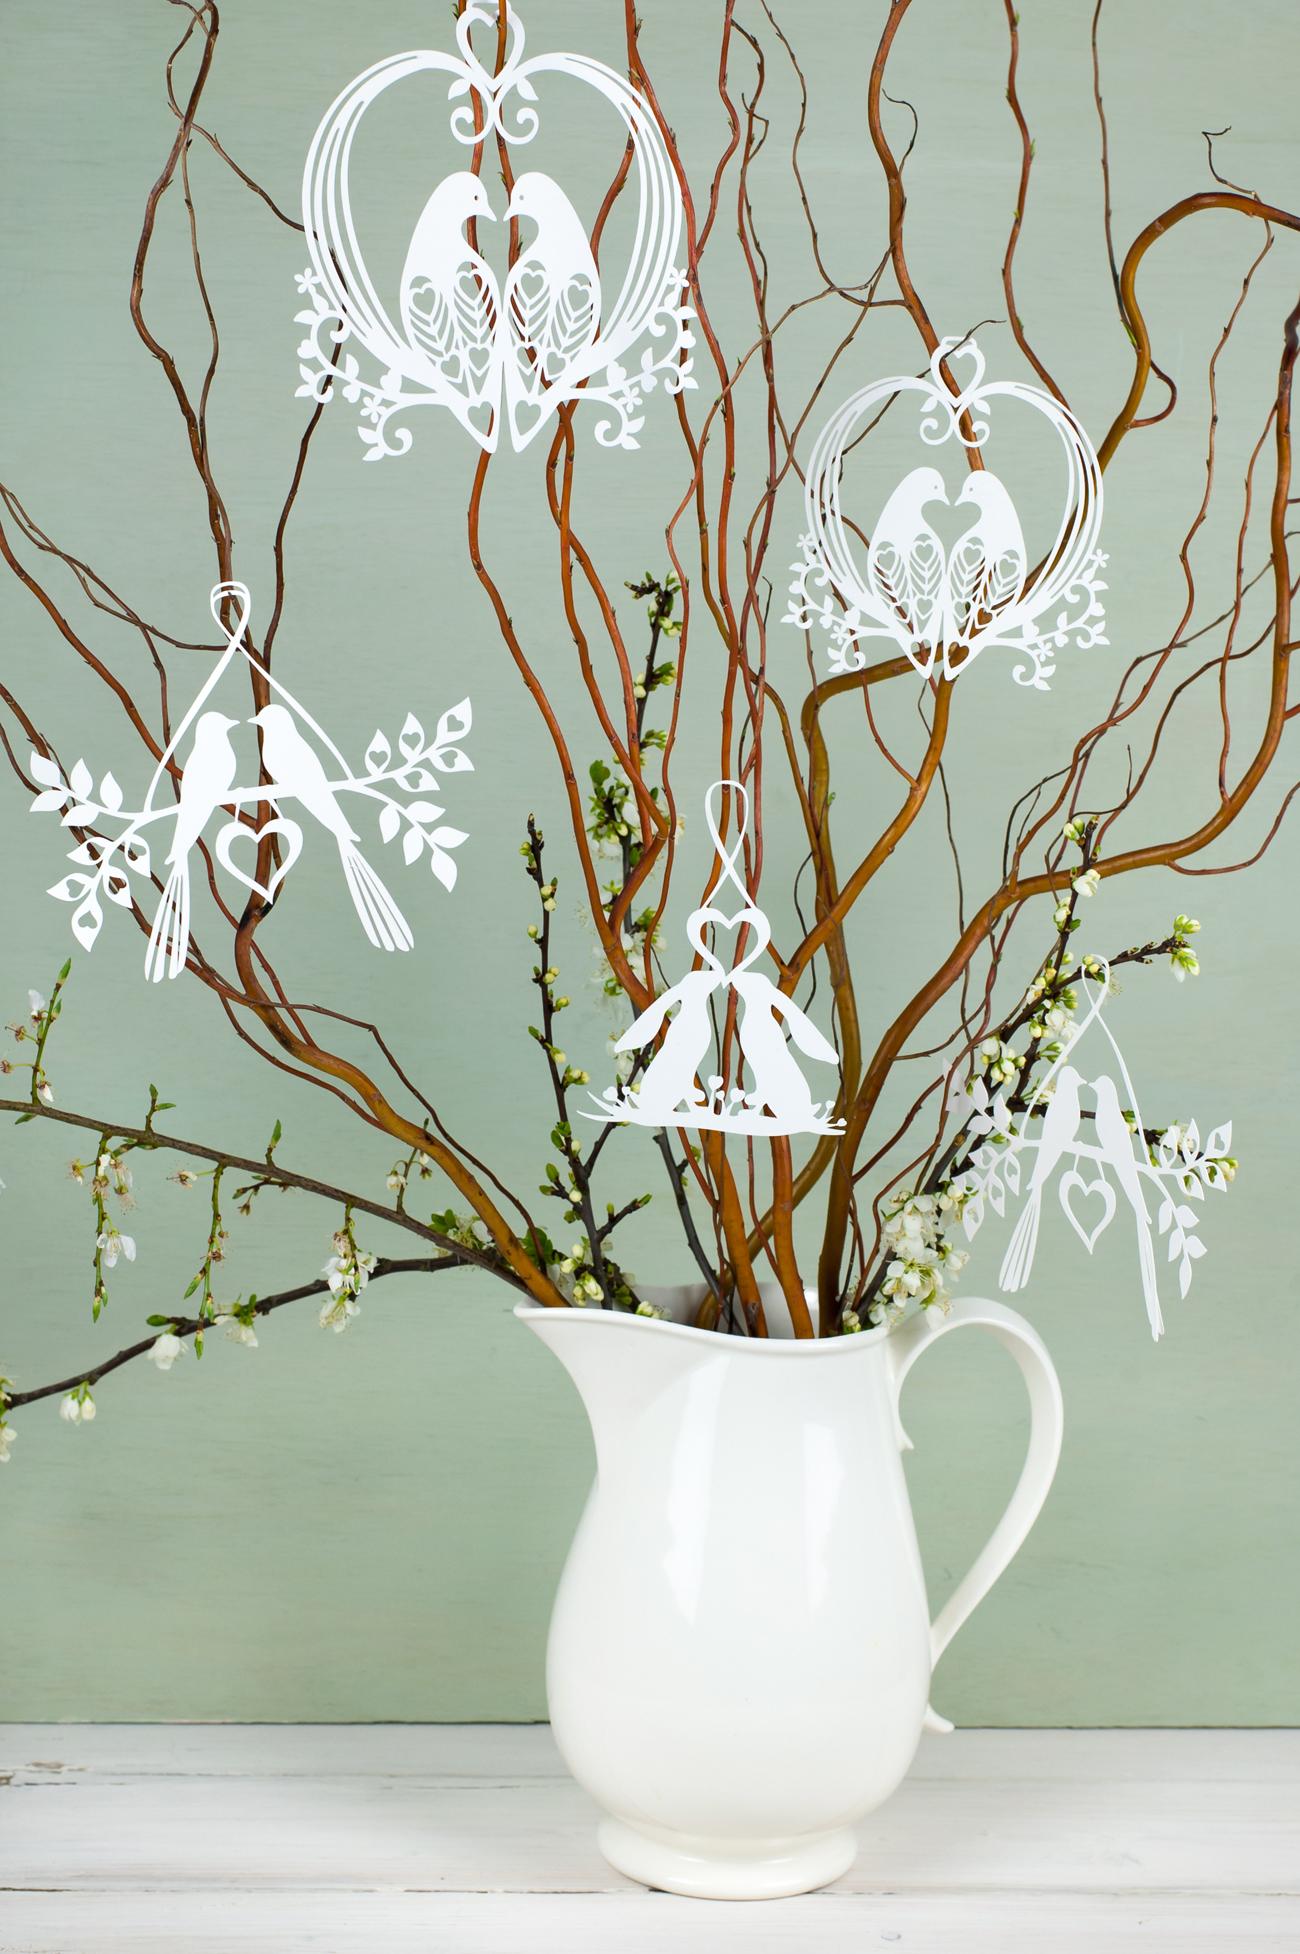 Paper cut hanging decorations